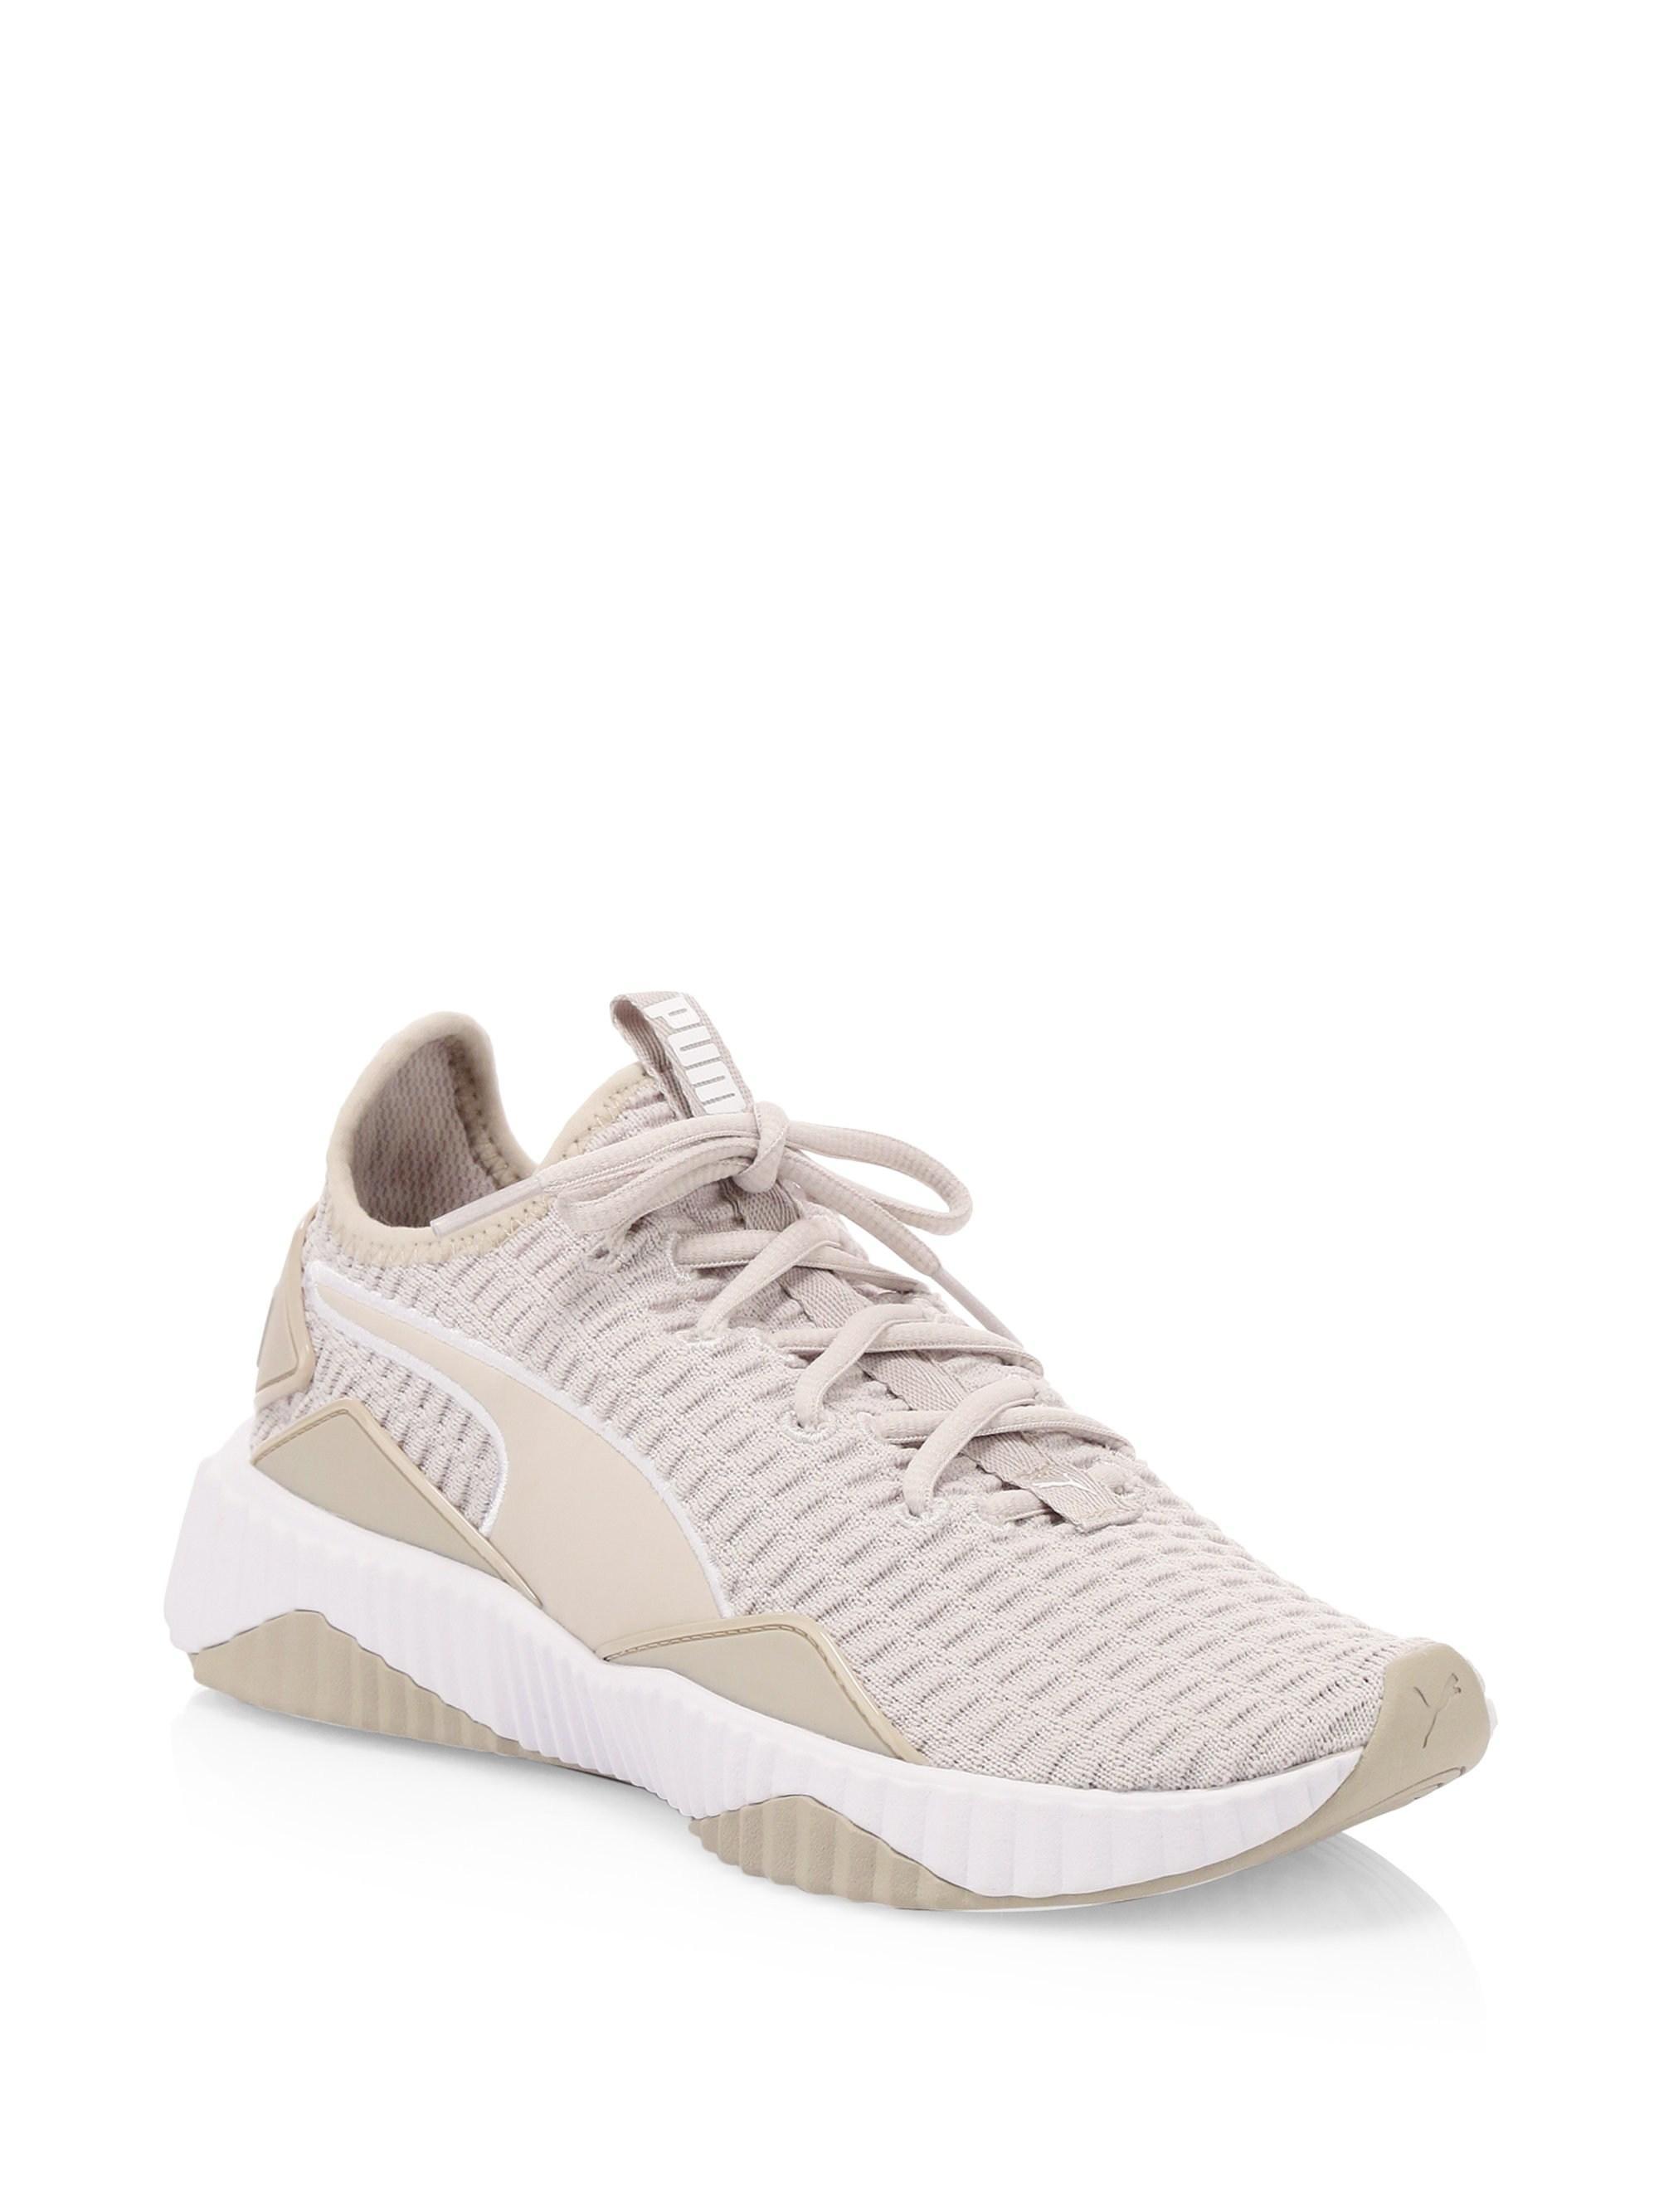 9dec2d3bc5d166 Lyst - PUMA Defy Mesh Sneakers in Gray